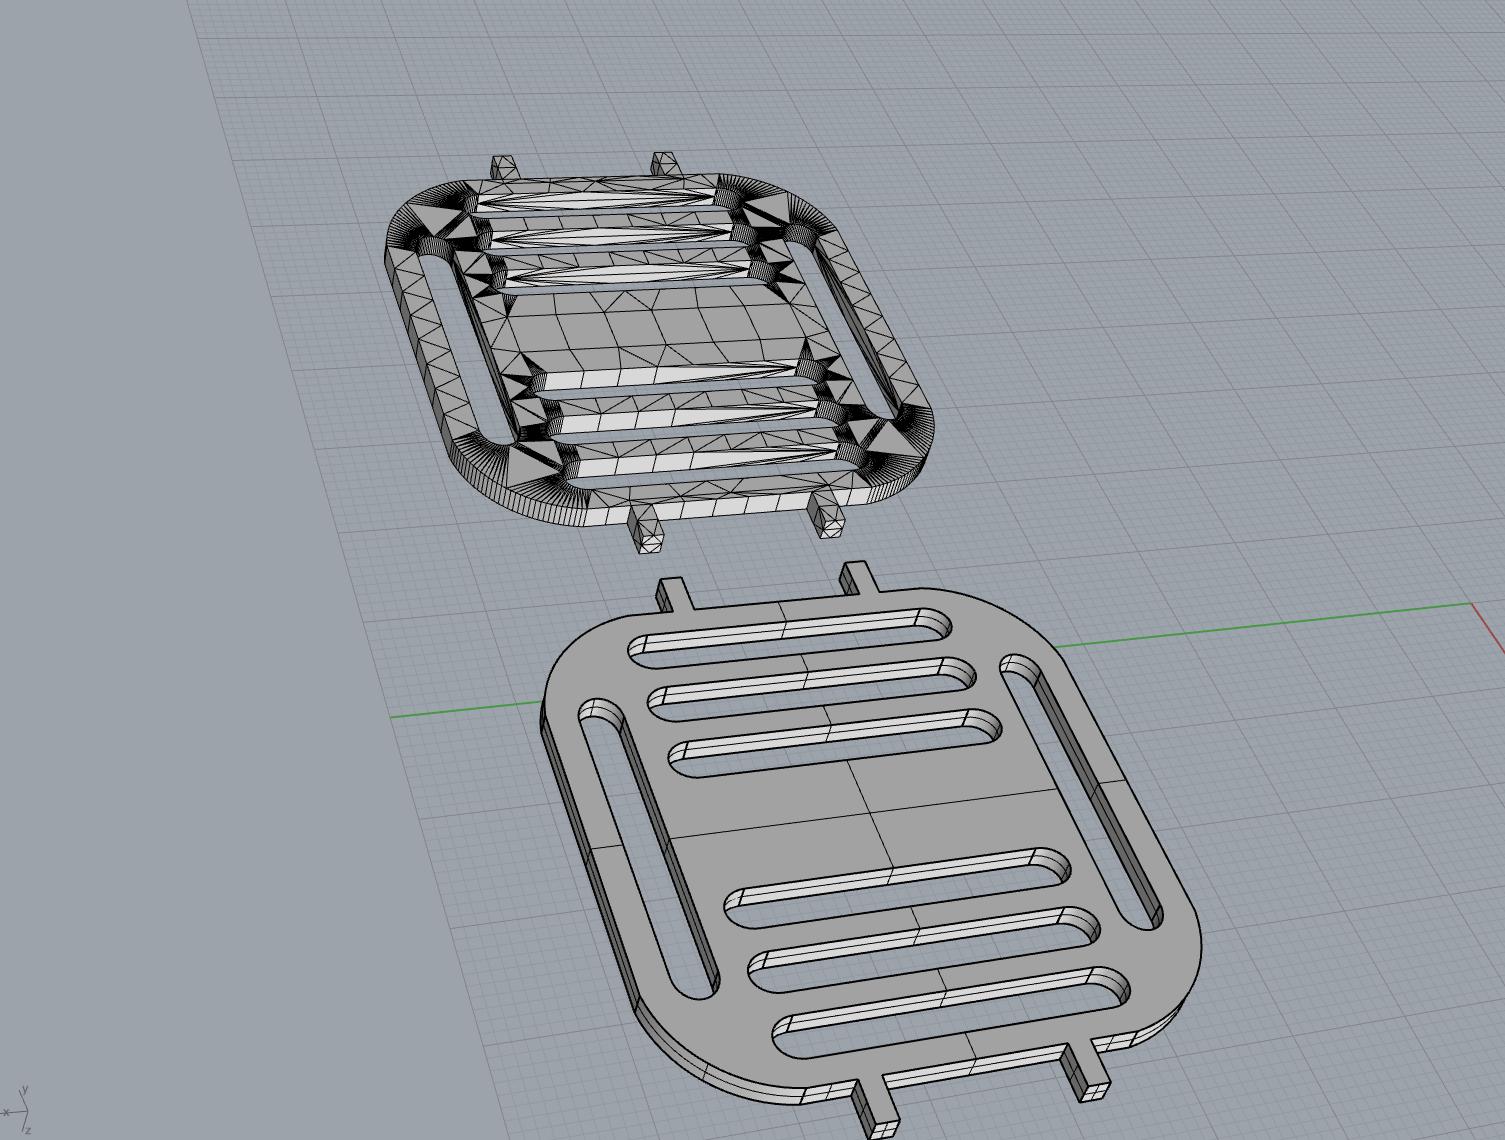 3d_printing_Screenshot_1_11_13_2_55_PM-2.jpg